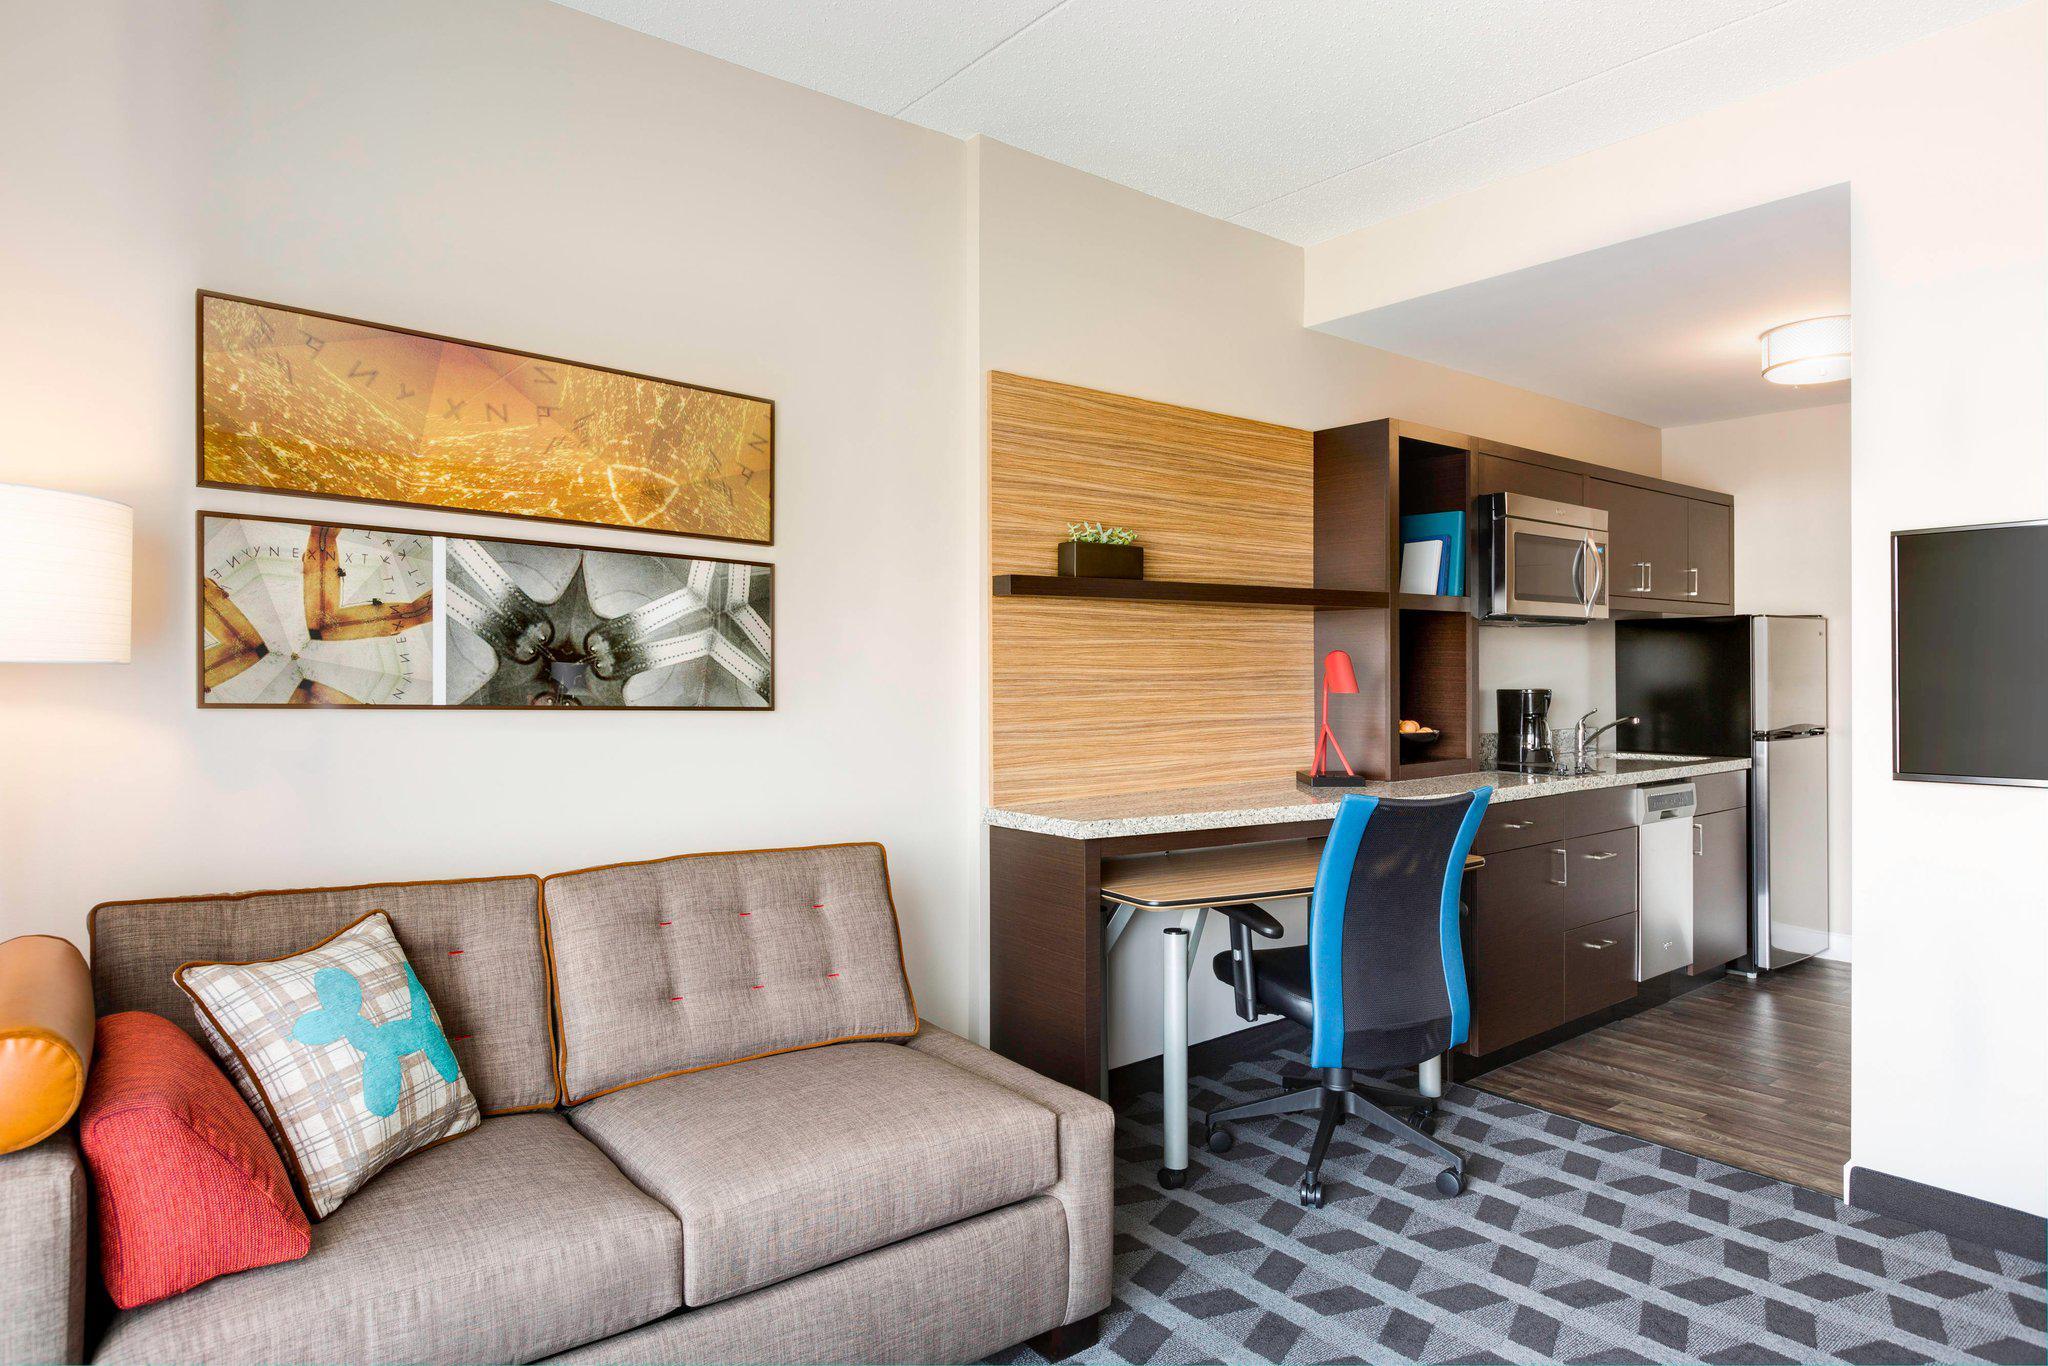 TownePlace Suites by Marriott Sarasota Bradenton West